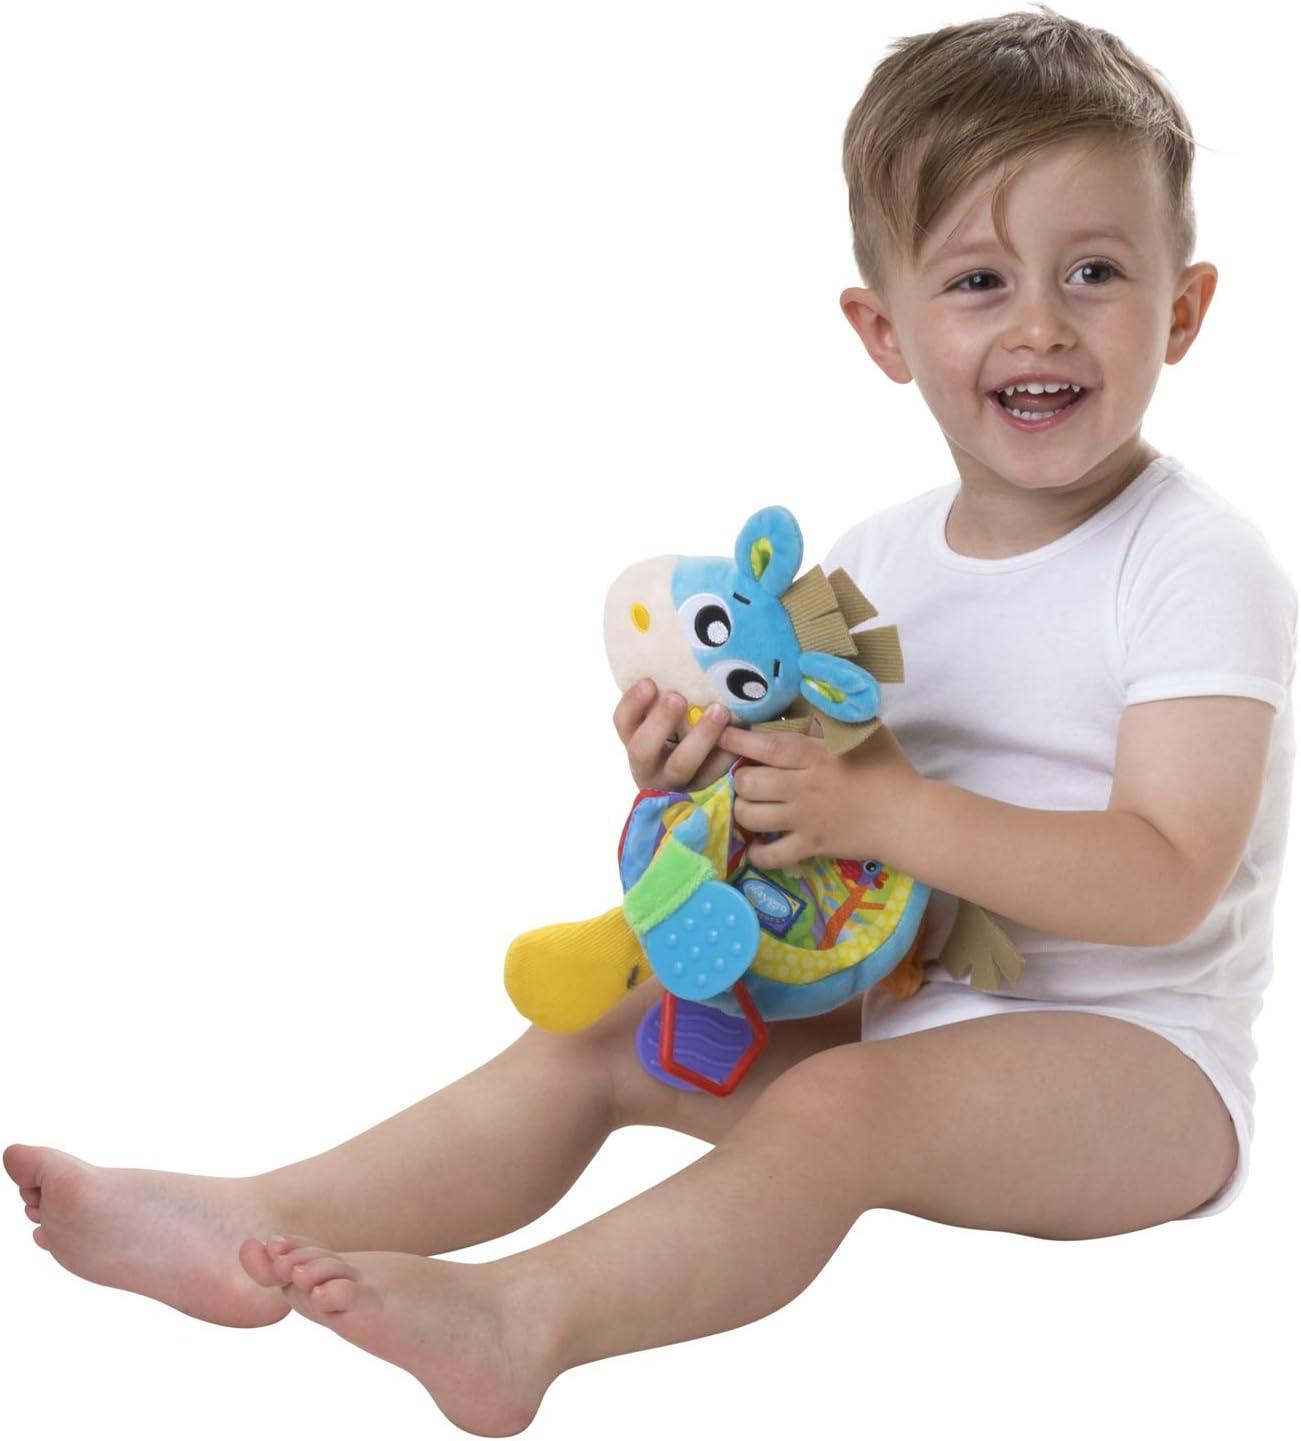 Dingly Dangly Clip Clop Playgro Kinderwagenanh/änger Klipp Klapp Pferd Blau//Bunt Ab 0 Monate 40145